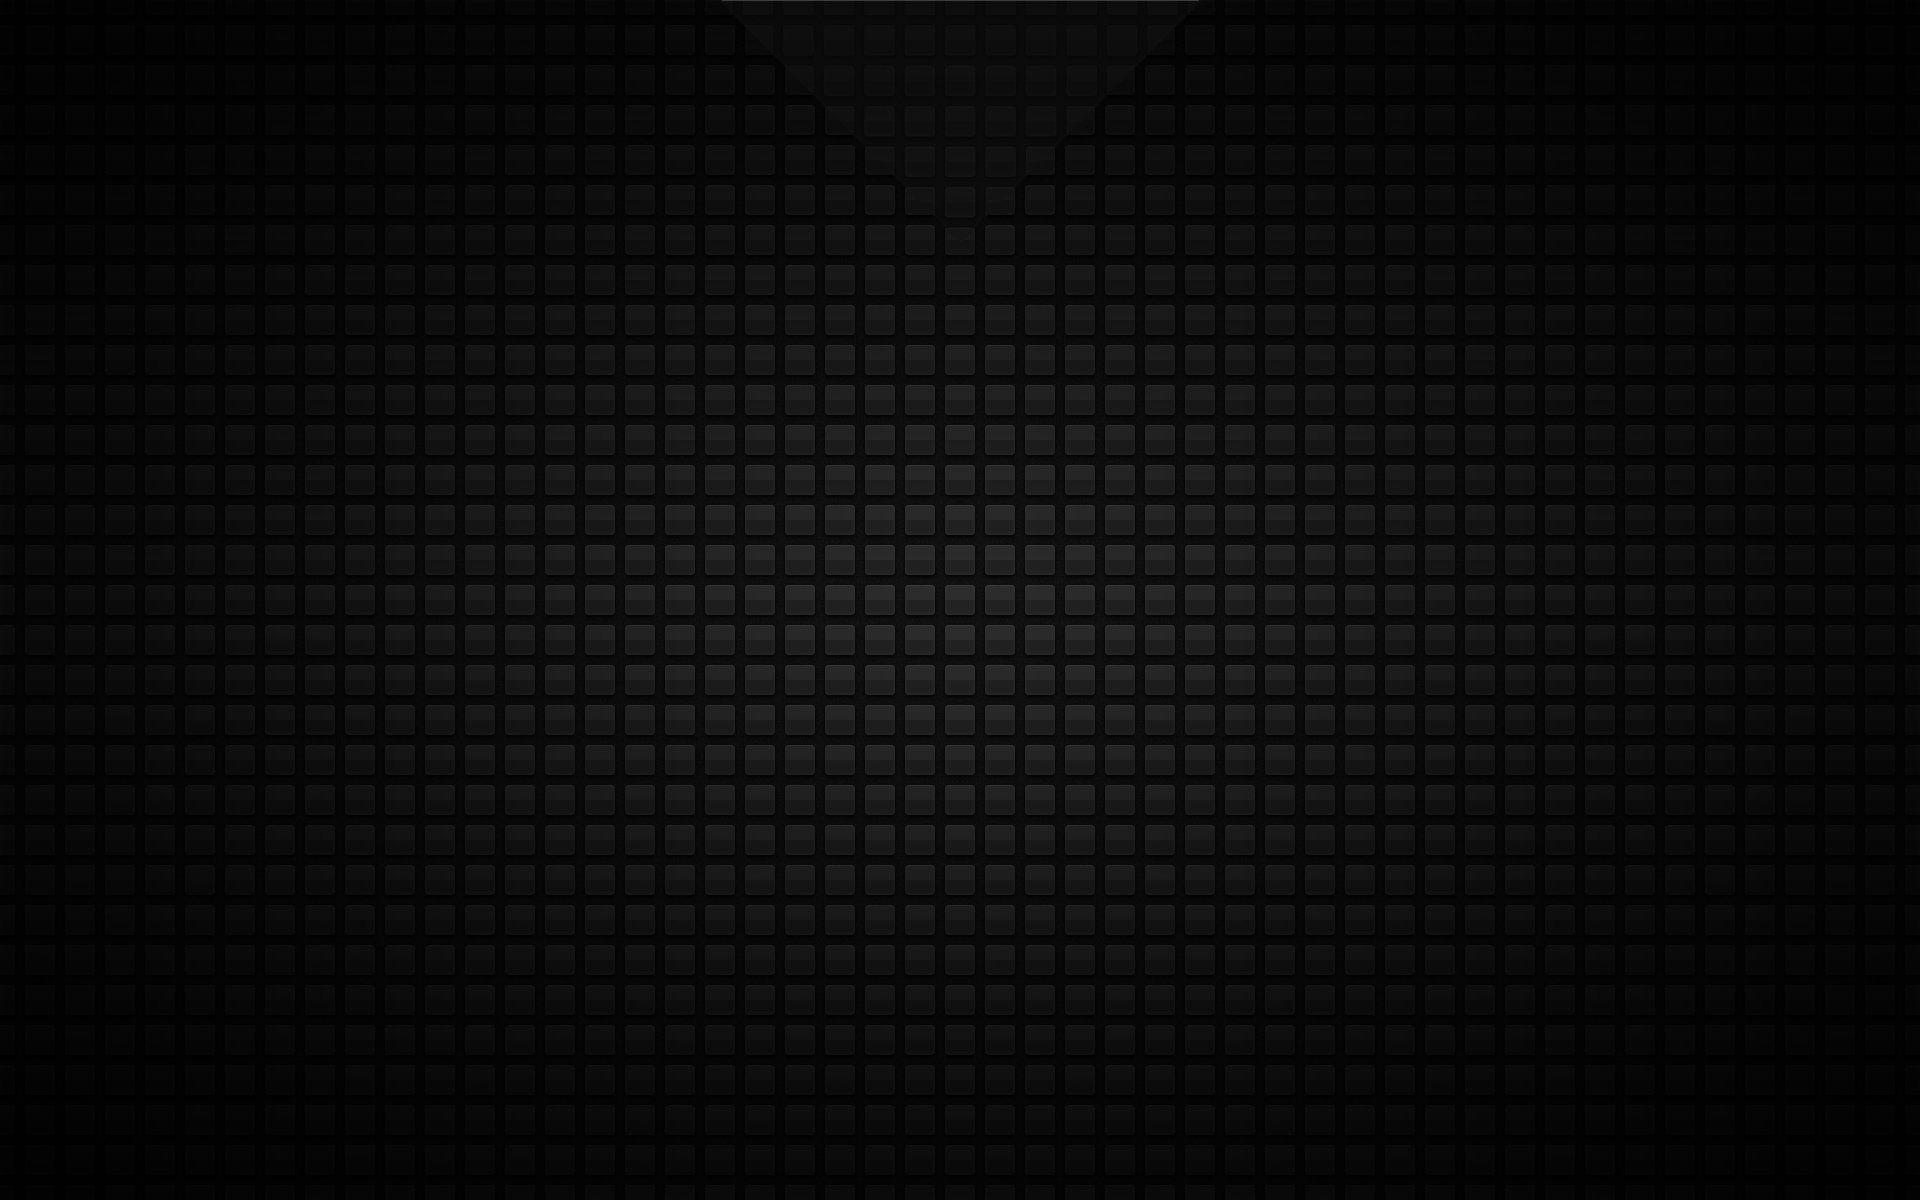 wallpaper hitam keren 156124 Hitam, Desain, Seni